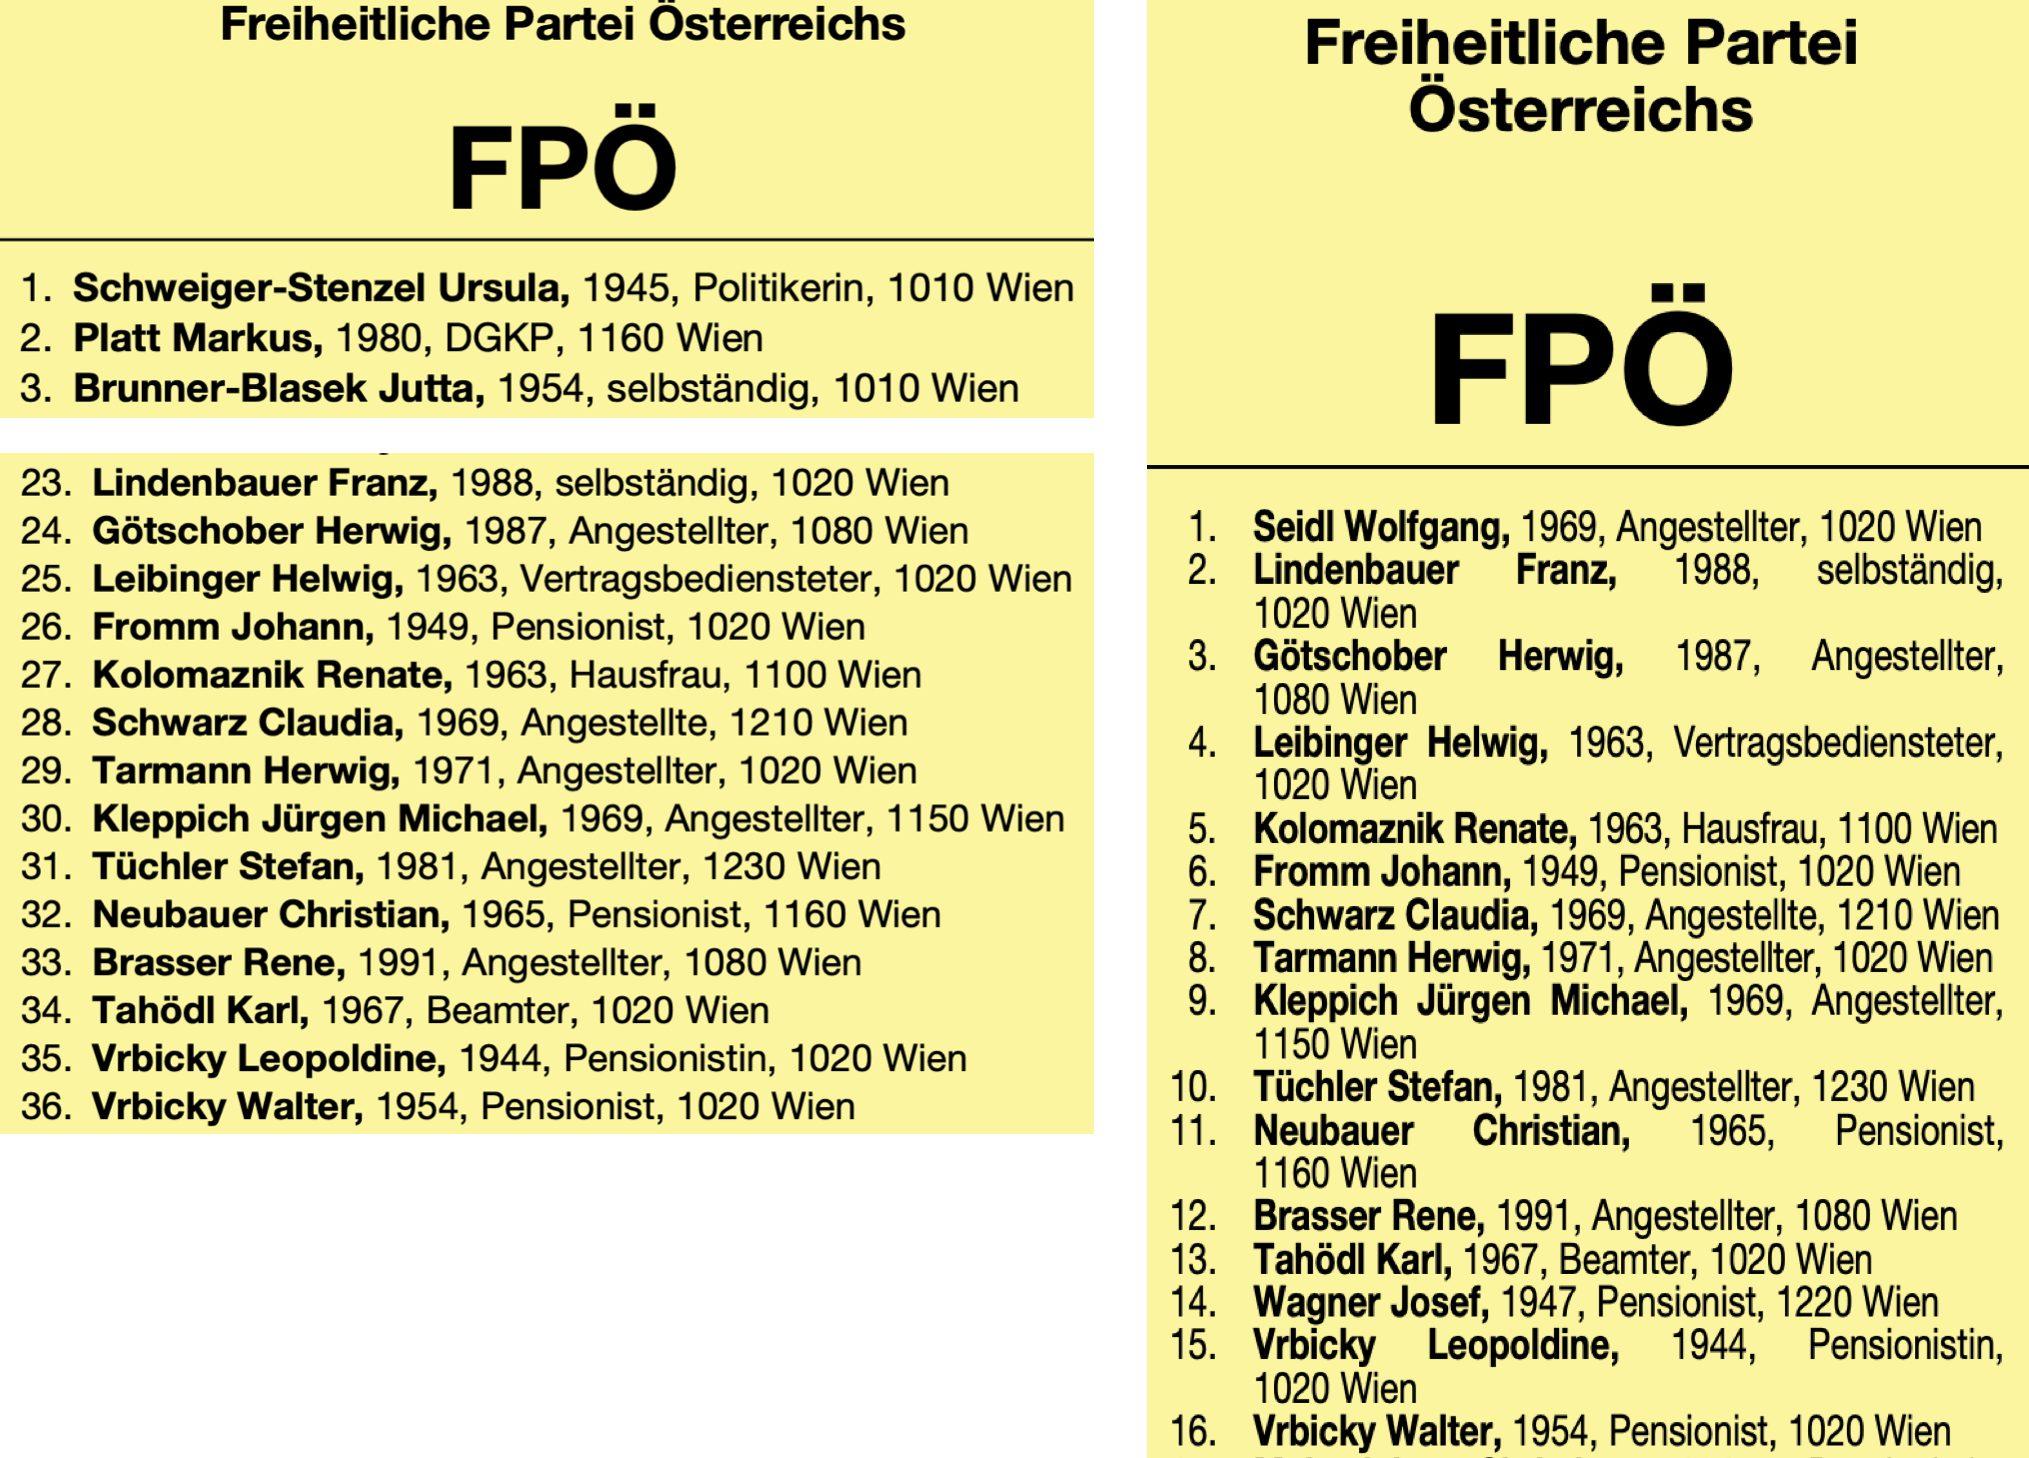 FPÖ 1. Bezirk (links), Liste aufgefüllt durch Kandidat*innen aus dem 2. Bezirk (rechts)